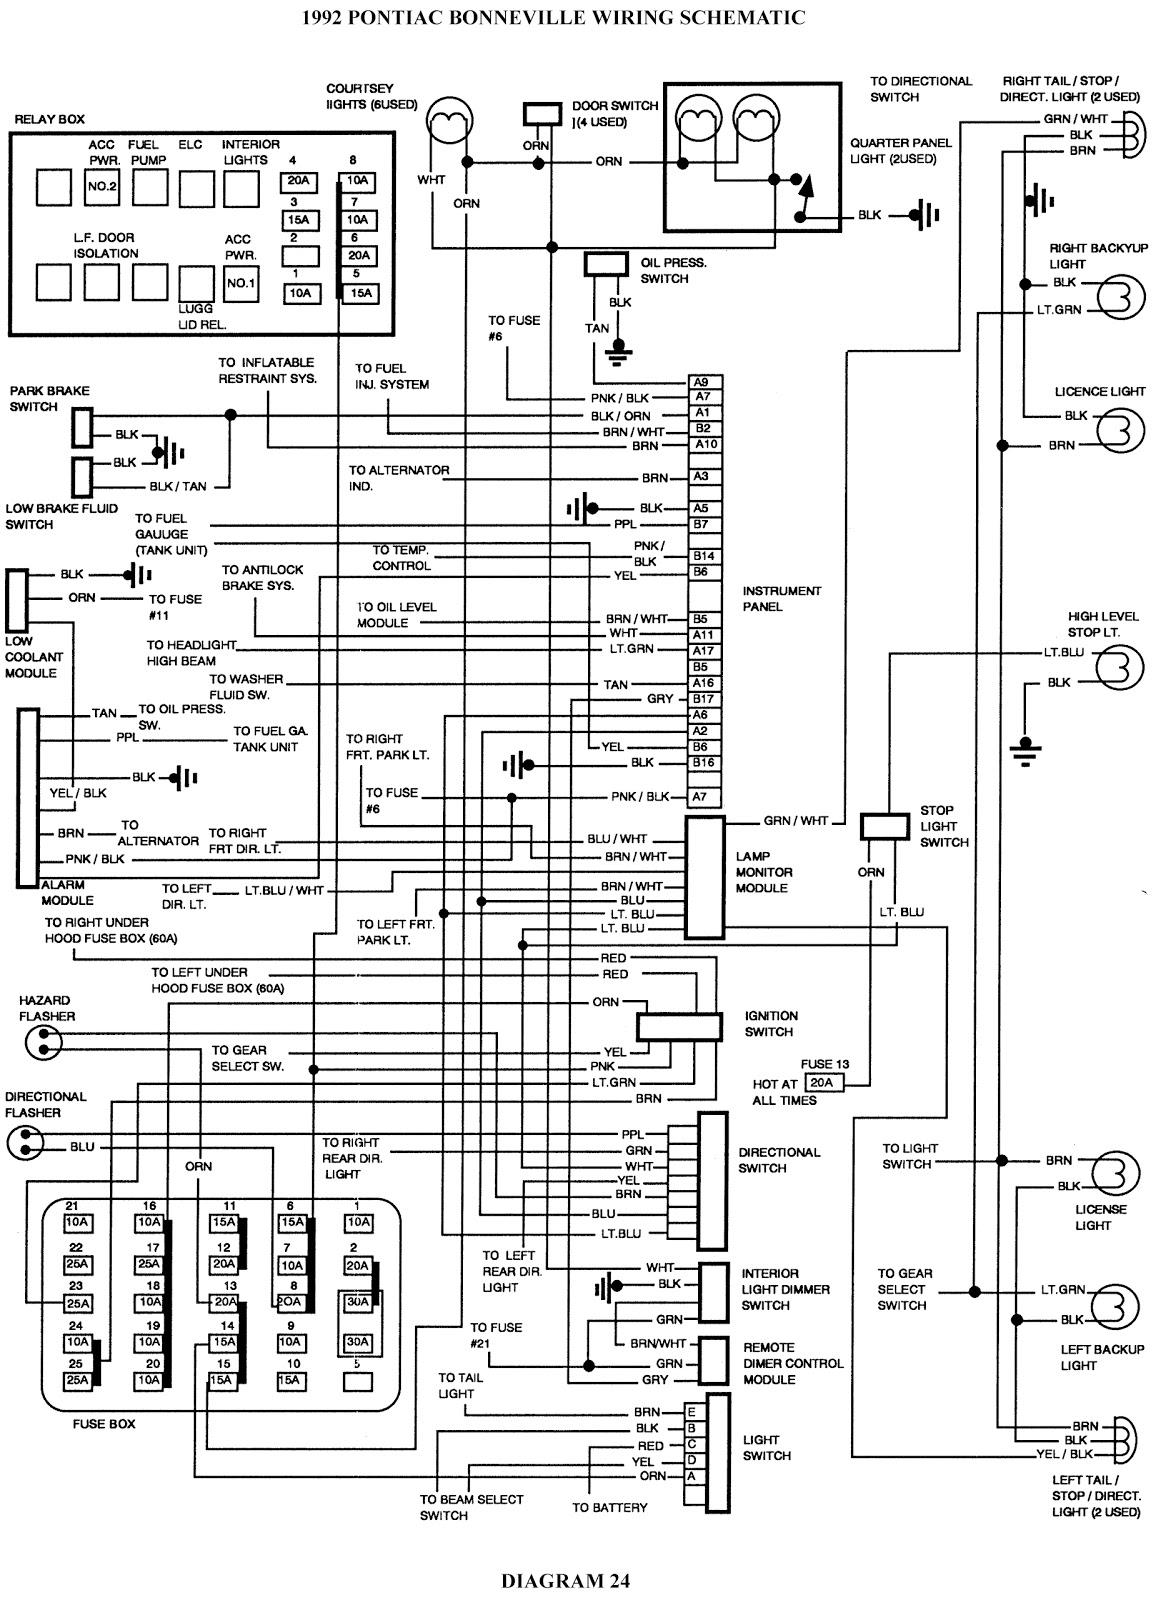 Wiring Diagram For 1991 Chevy Lumina Wiring Get Free